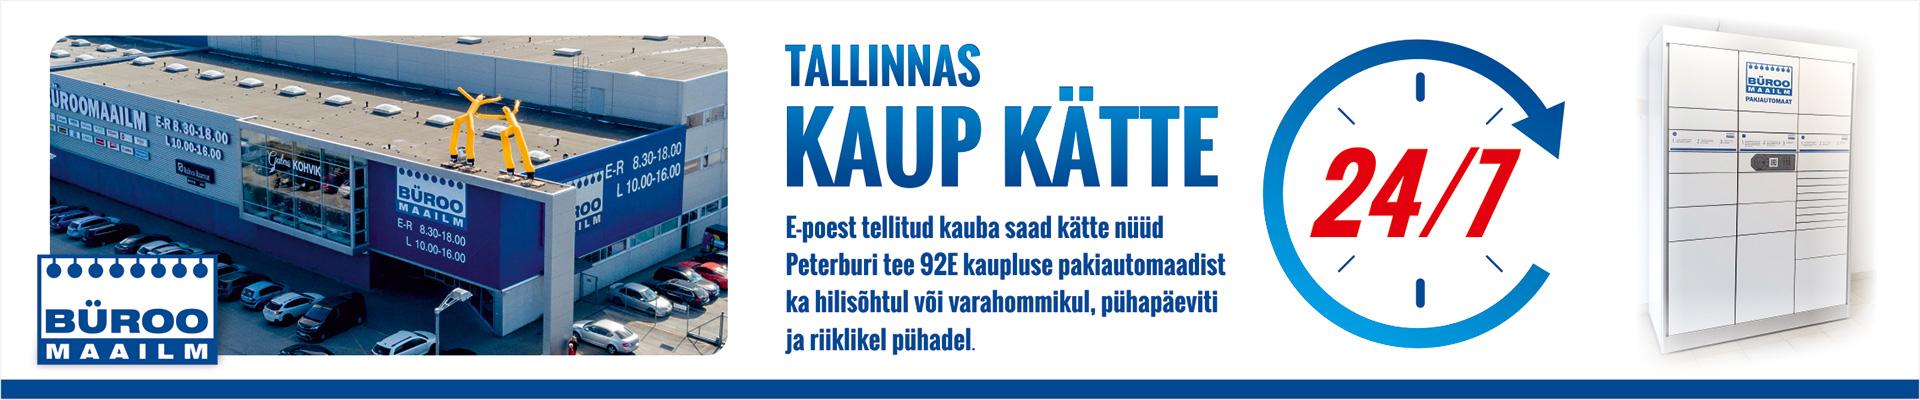 TALLINNAS KAUP KÄTTE 24/7